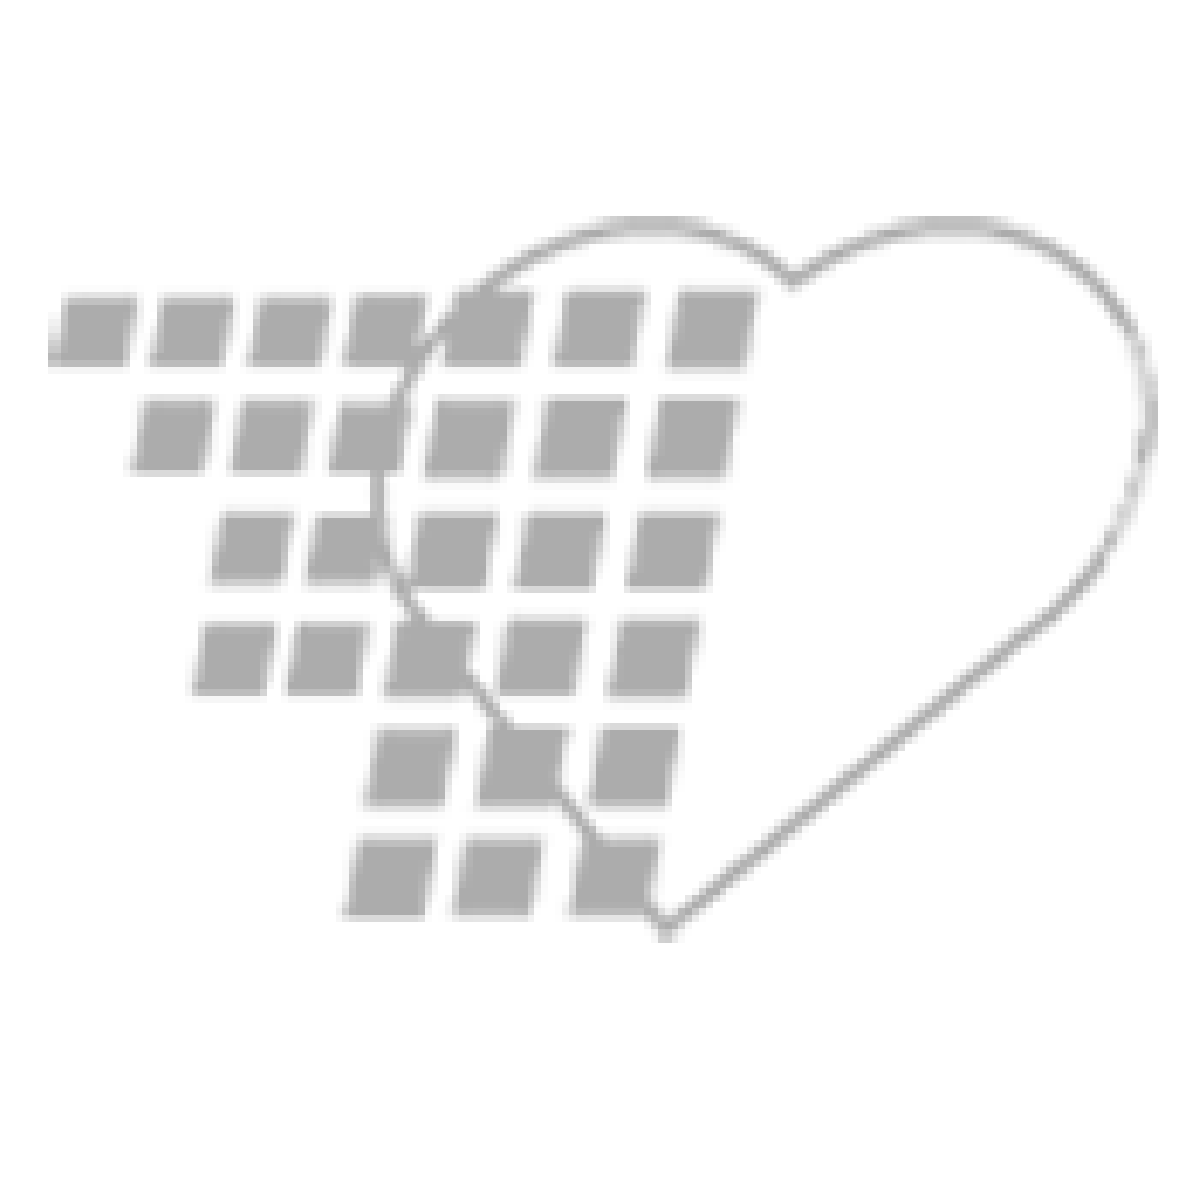 06-21-7861 BD™ Vacutainer® PLUS Plastic K2EDTA Whole Blood Tube - 4 mL Draw with Lavender BD Hemogard™ Closure